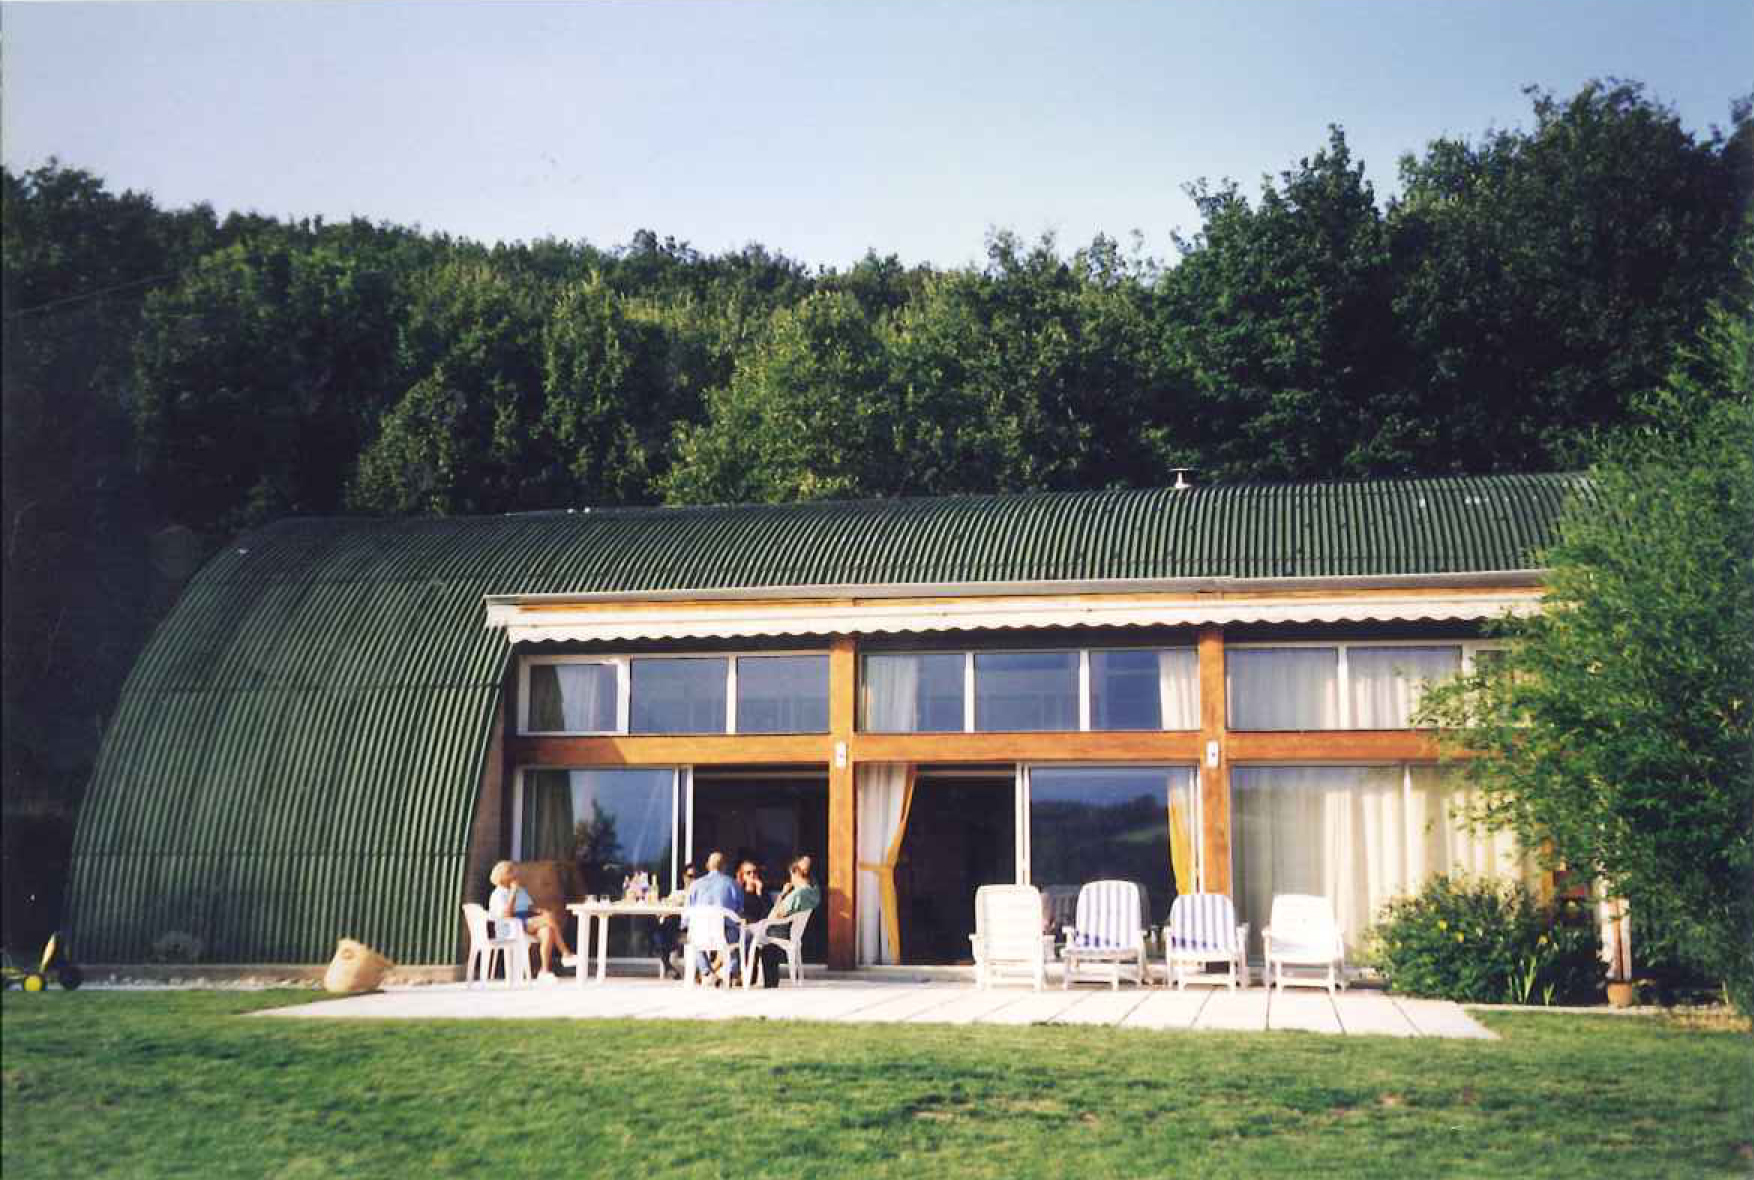 Maison liebeling agence denain for Agence logement